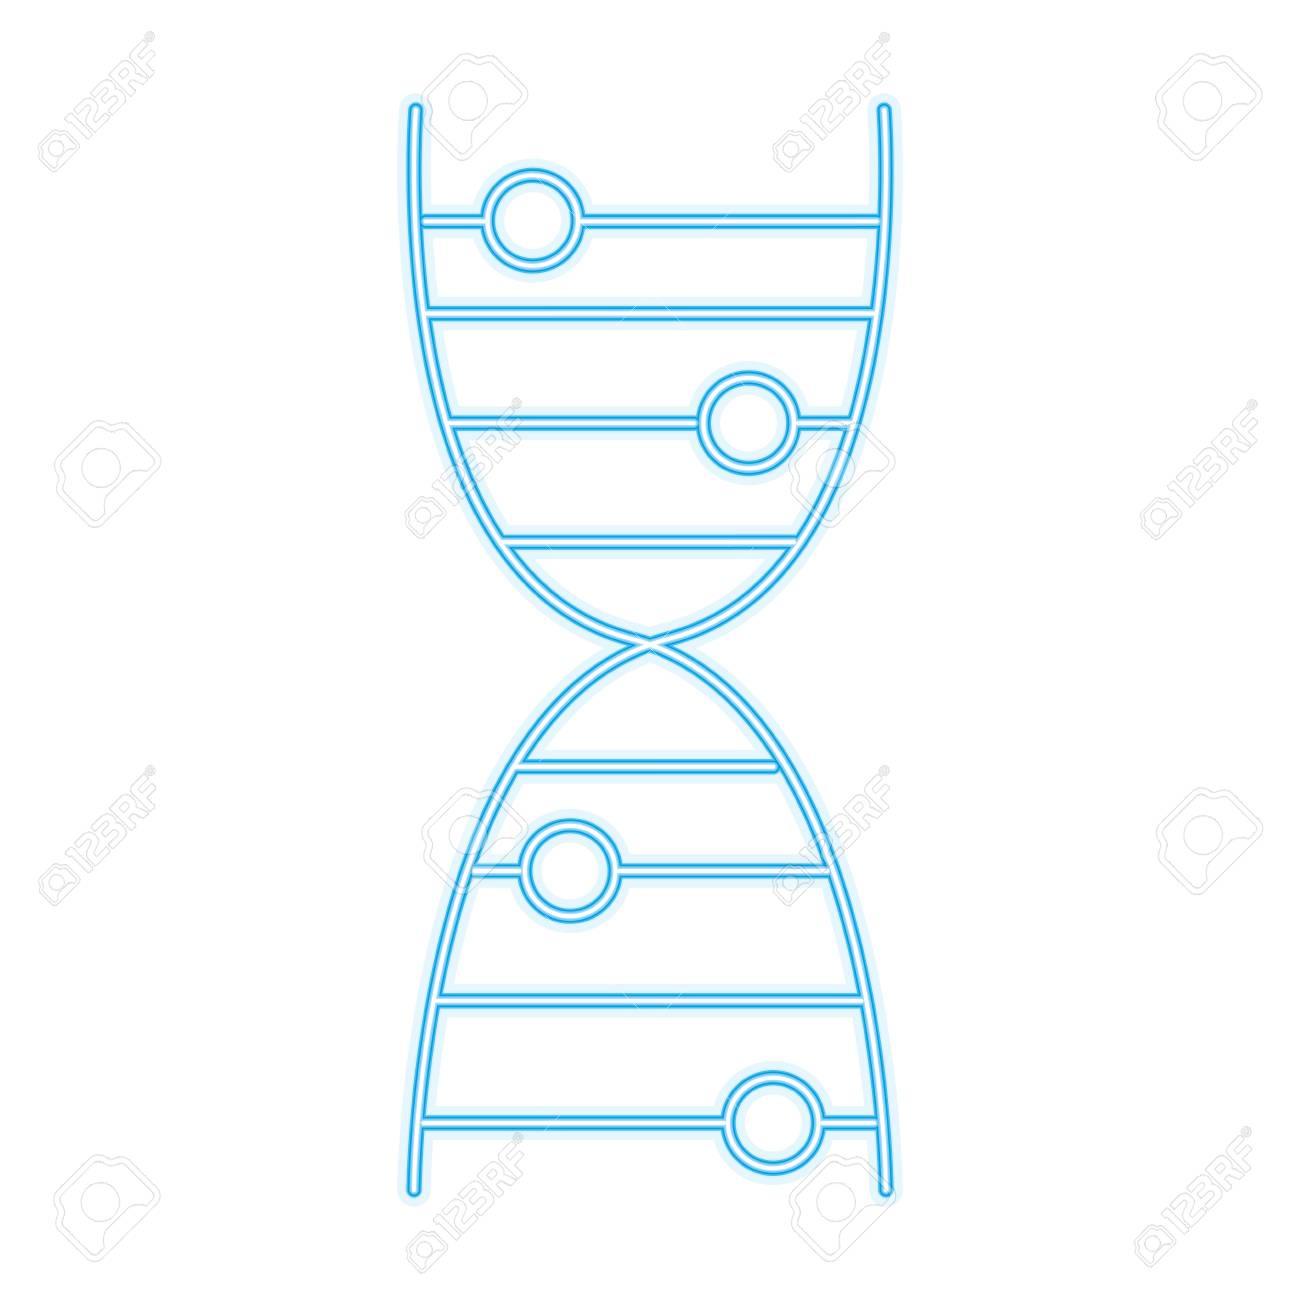 Human Dna Symbol Line Icon Vector Illustration Graphic Royalty Free